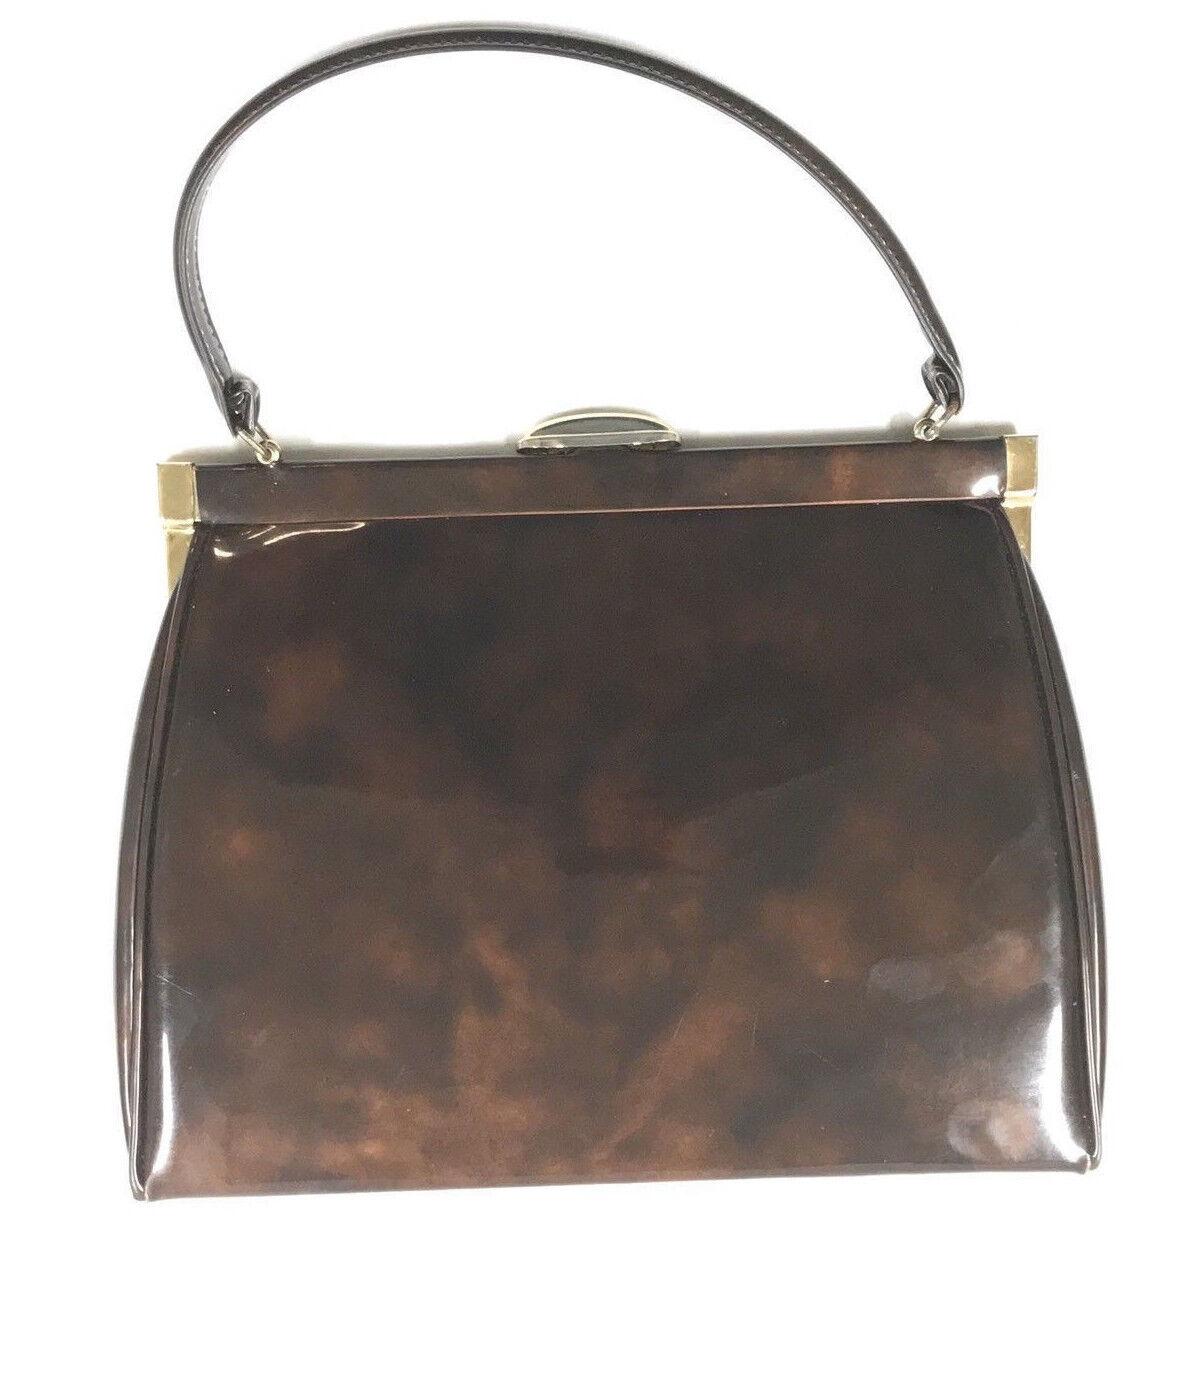 JULIUS RESNICK Marbled Patent Brown Leather Purse Handbag